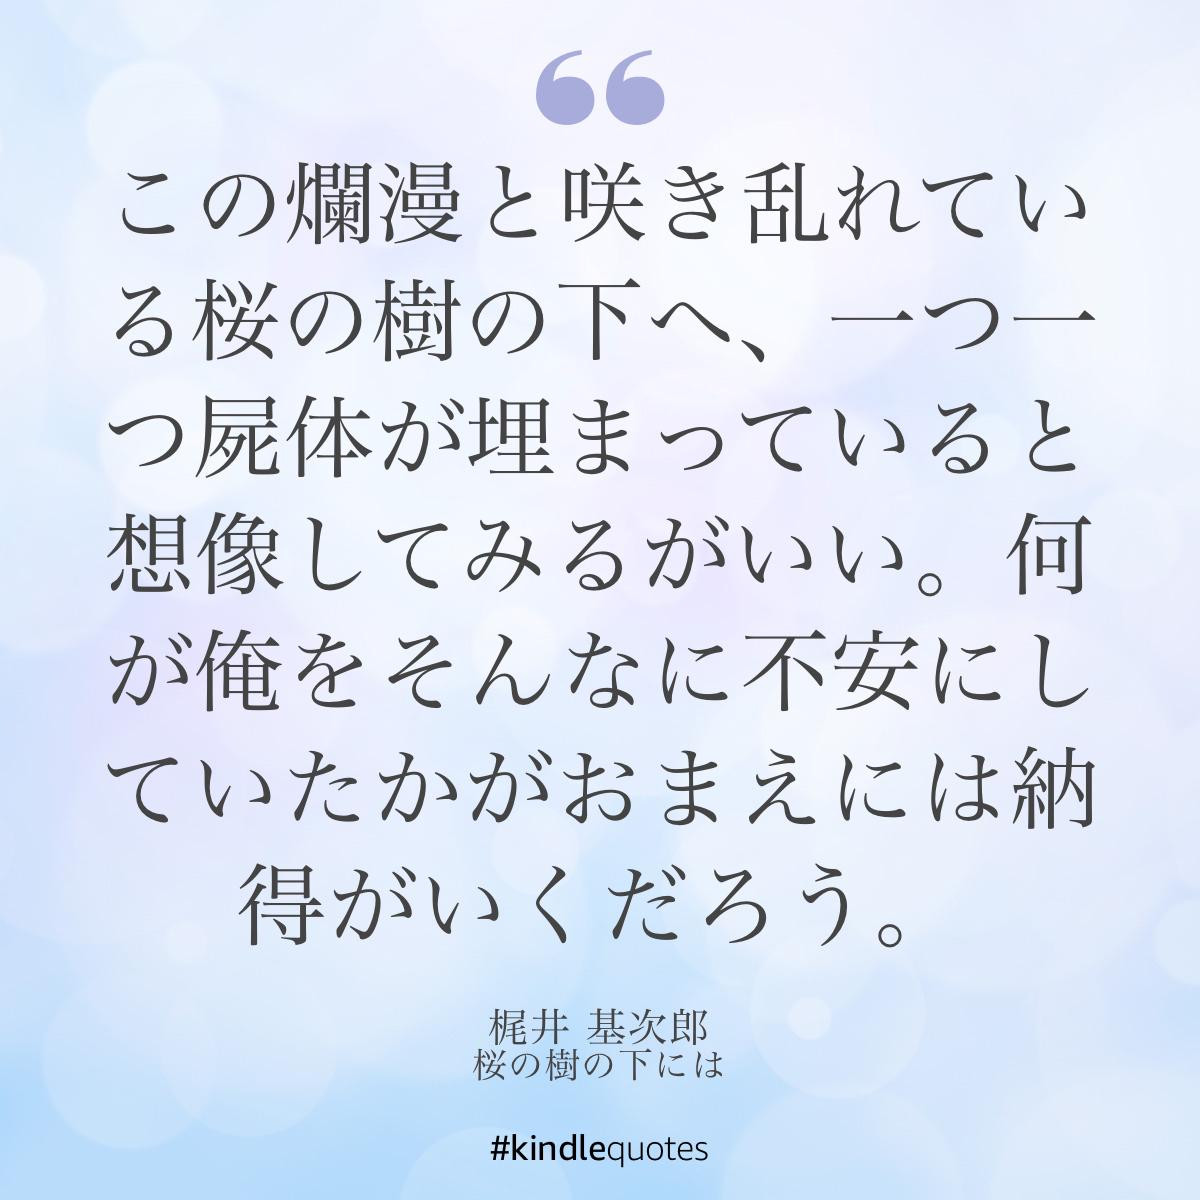 f:id:ichieda:20210325205543j:plain